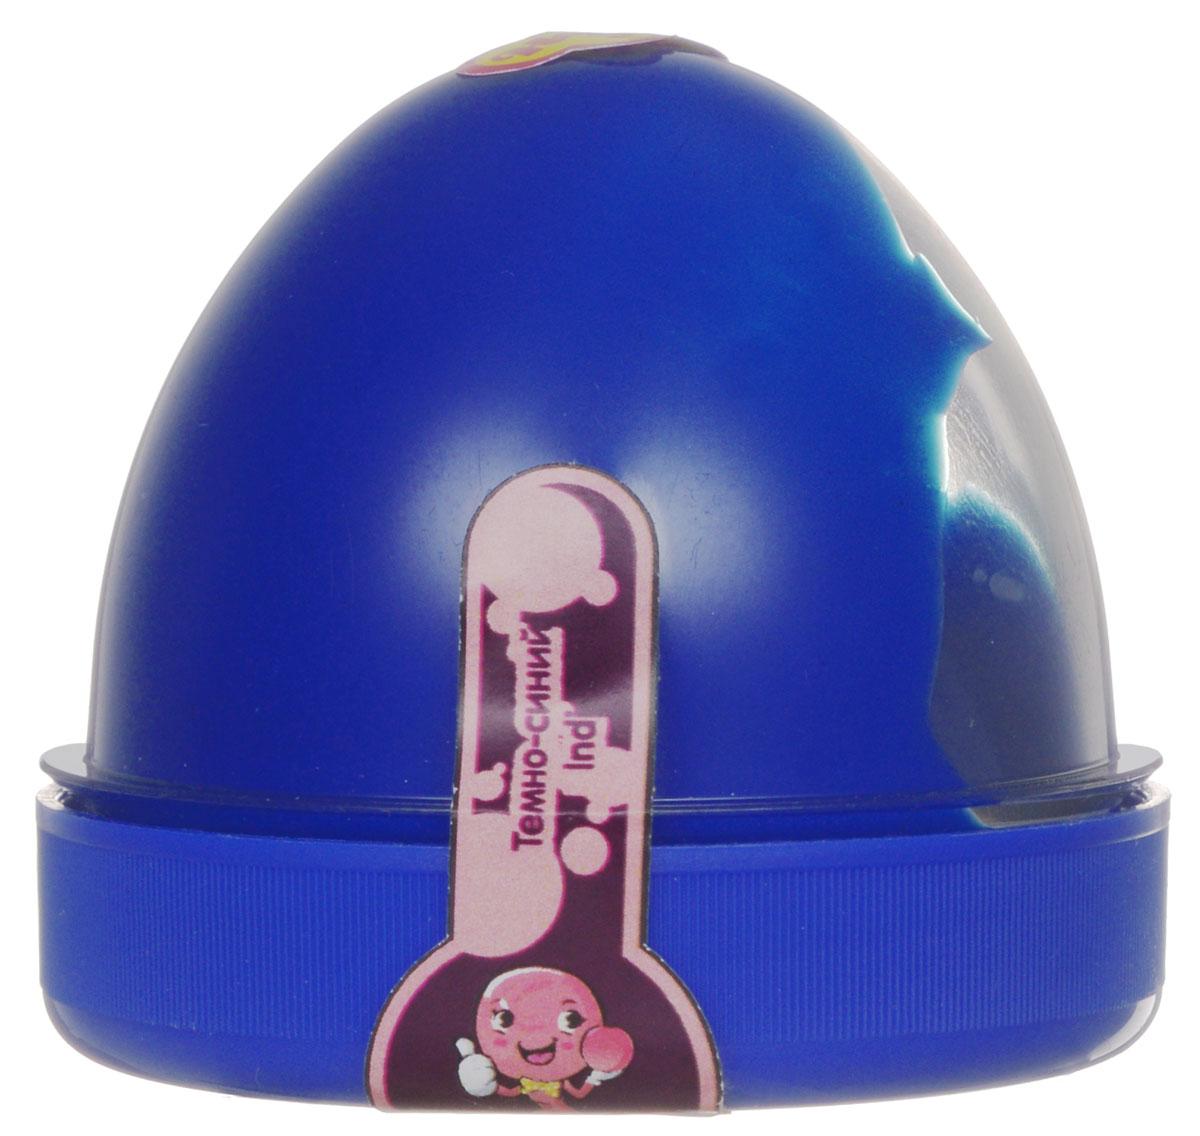 Жвачка для рук ТМ HandGum, цвет: темно-синий, с запахом бубль-гума, 35 г